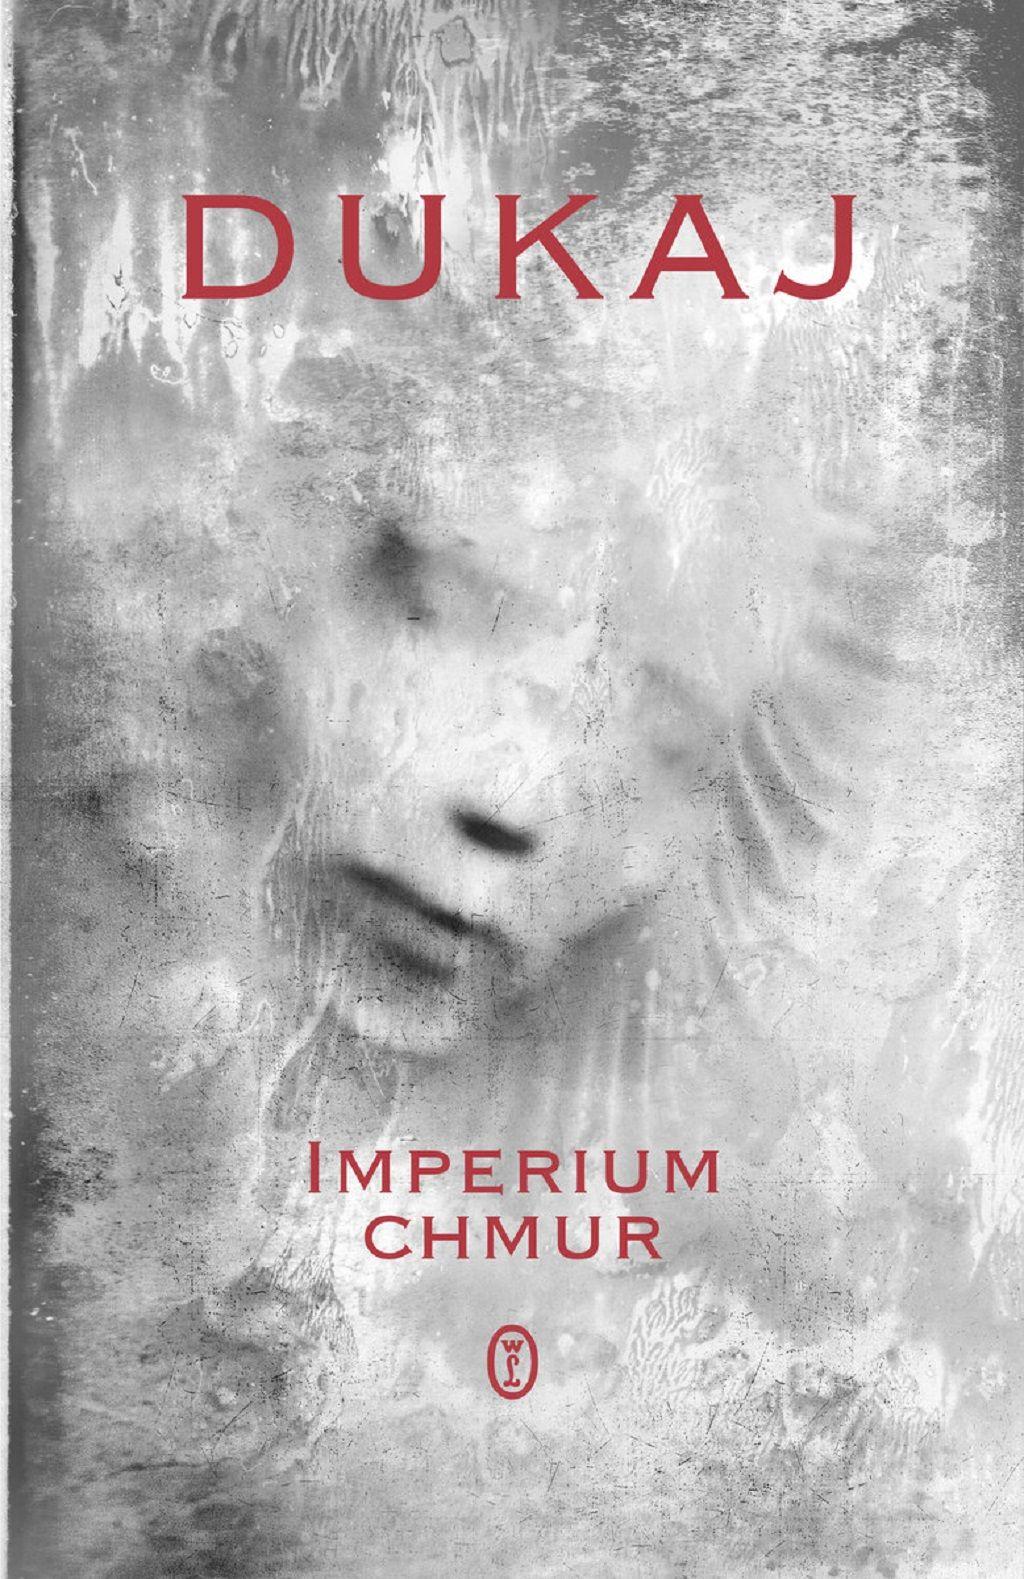 Jacek Dukaj – Imperium chmur